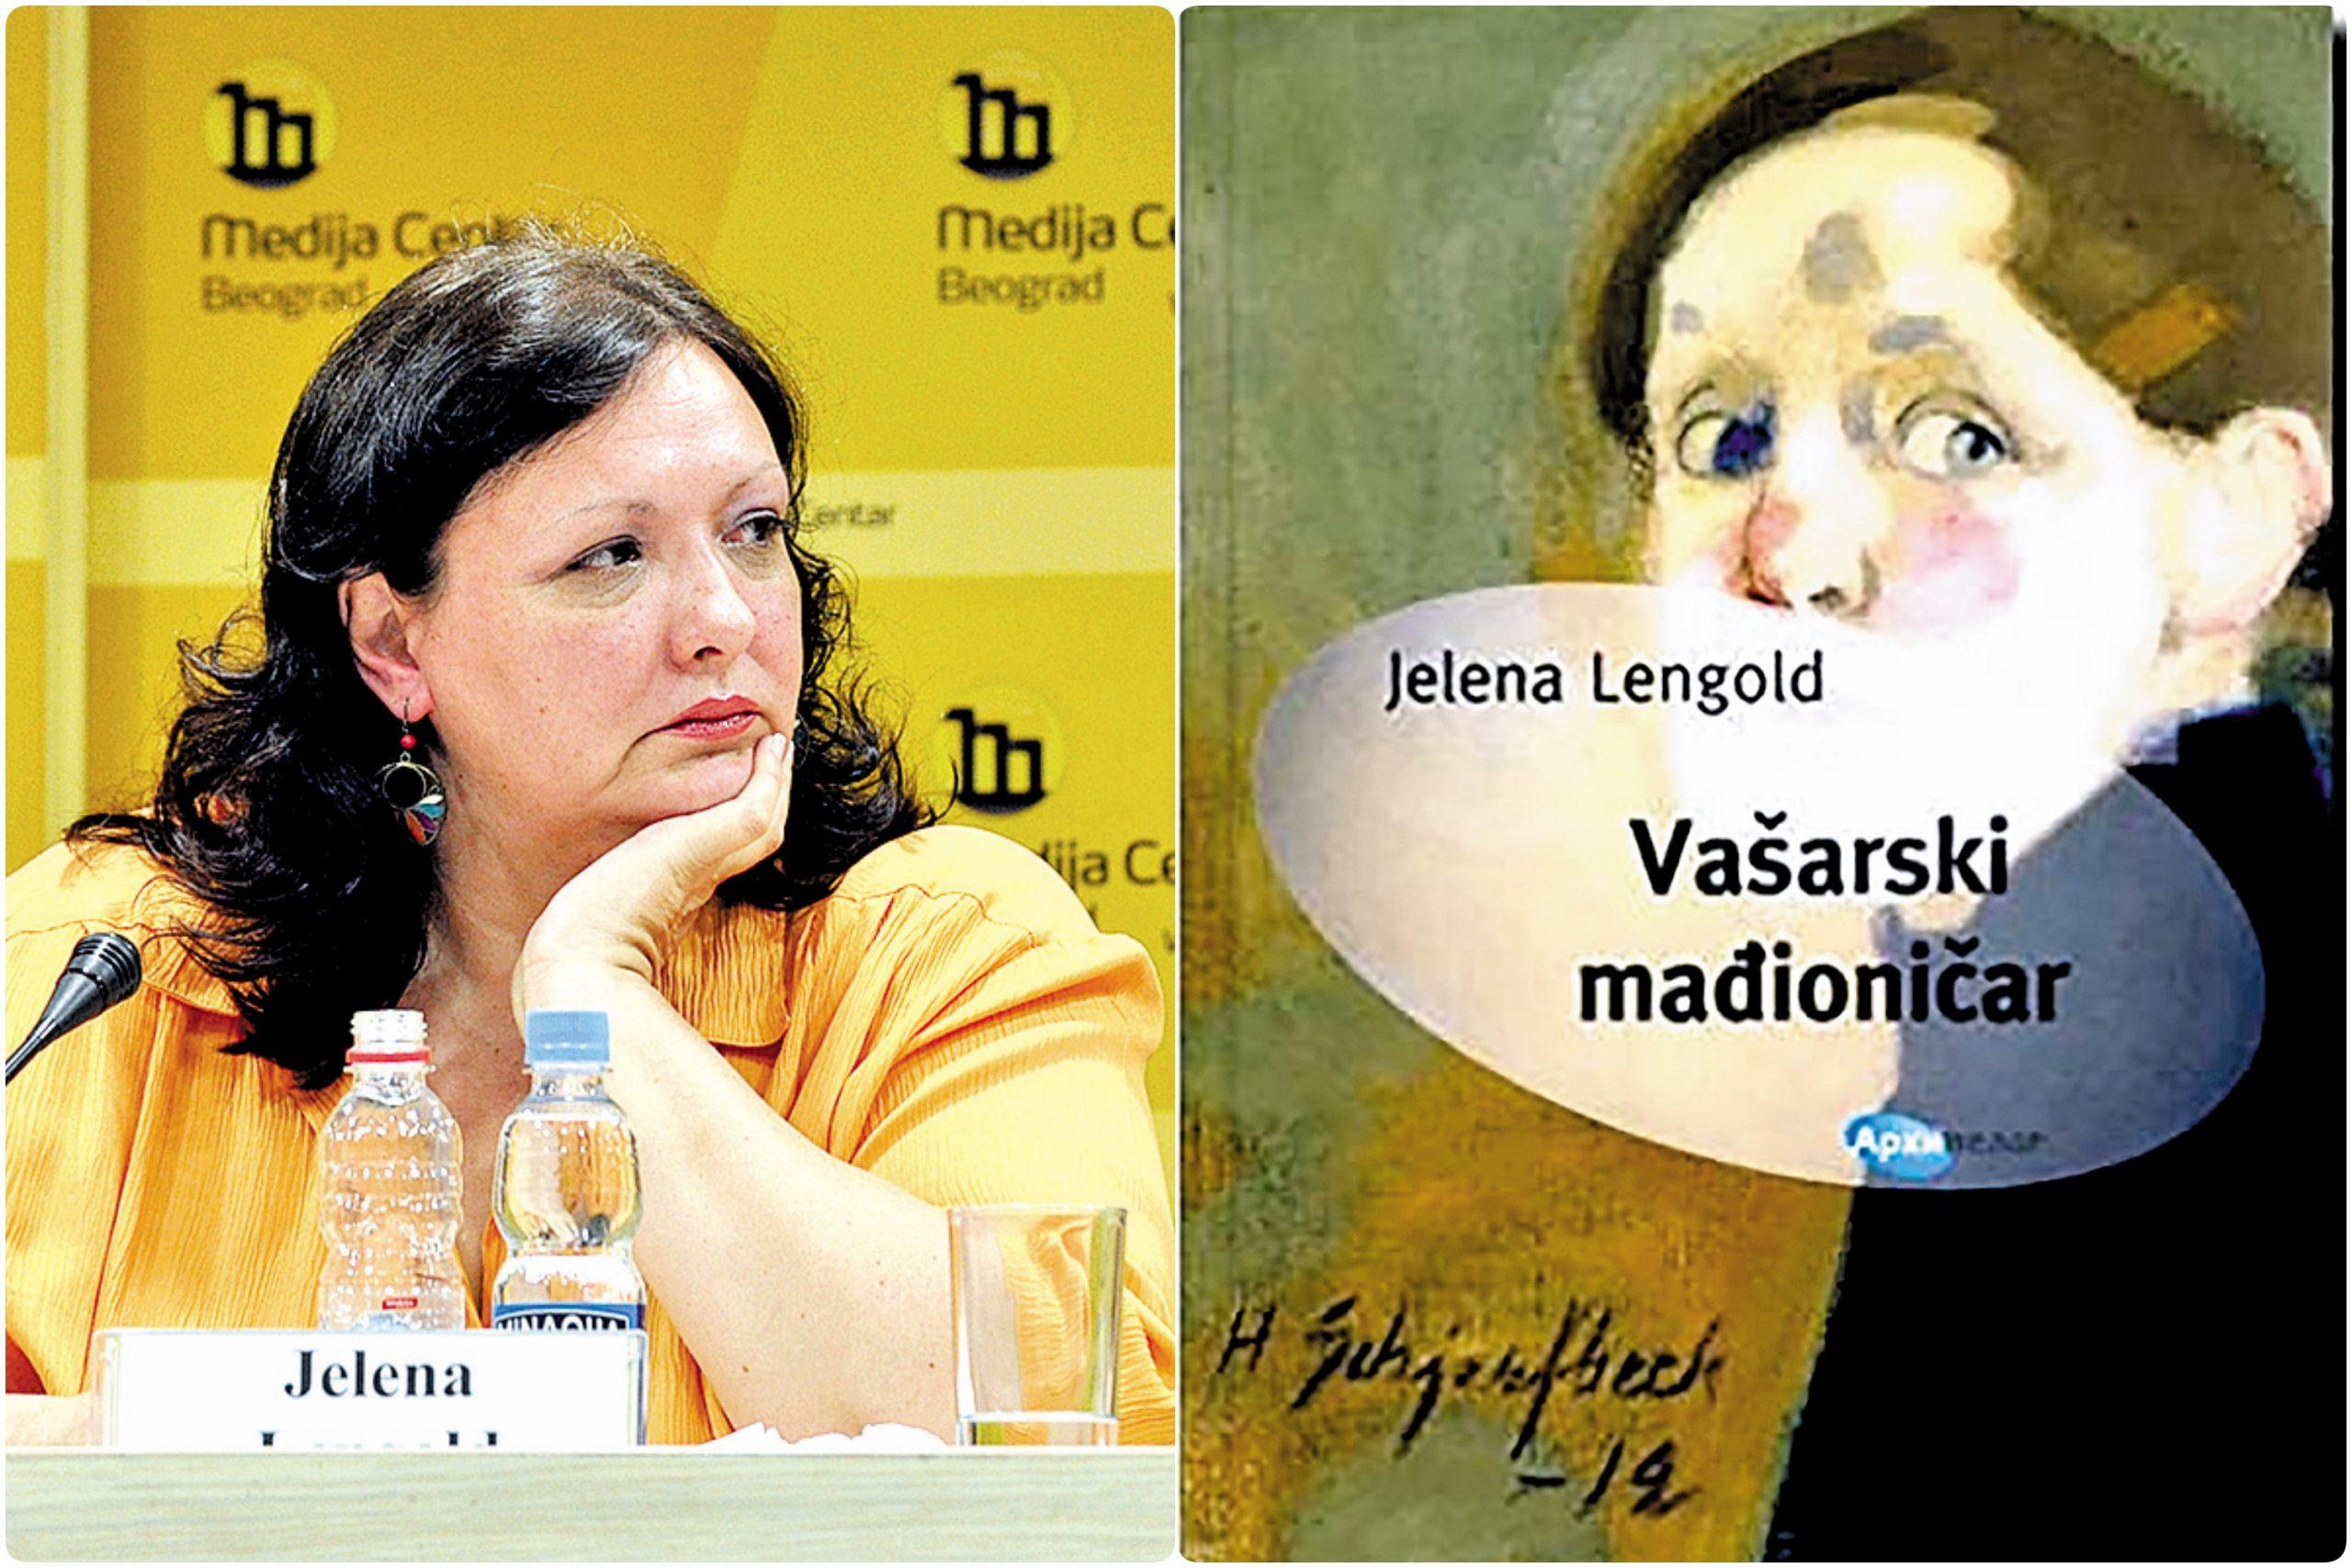 Jelena Lengold Vasarski madjionicar